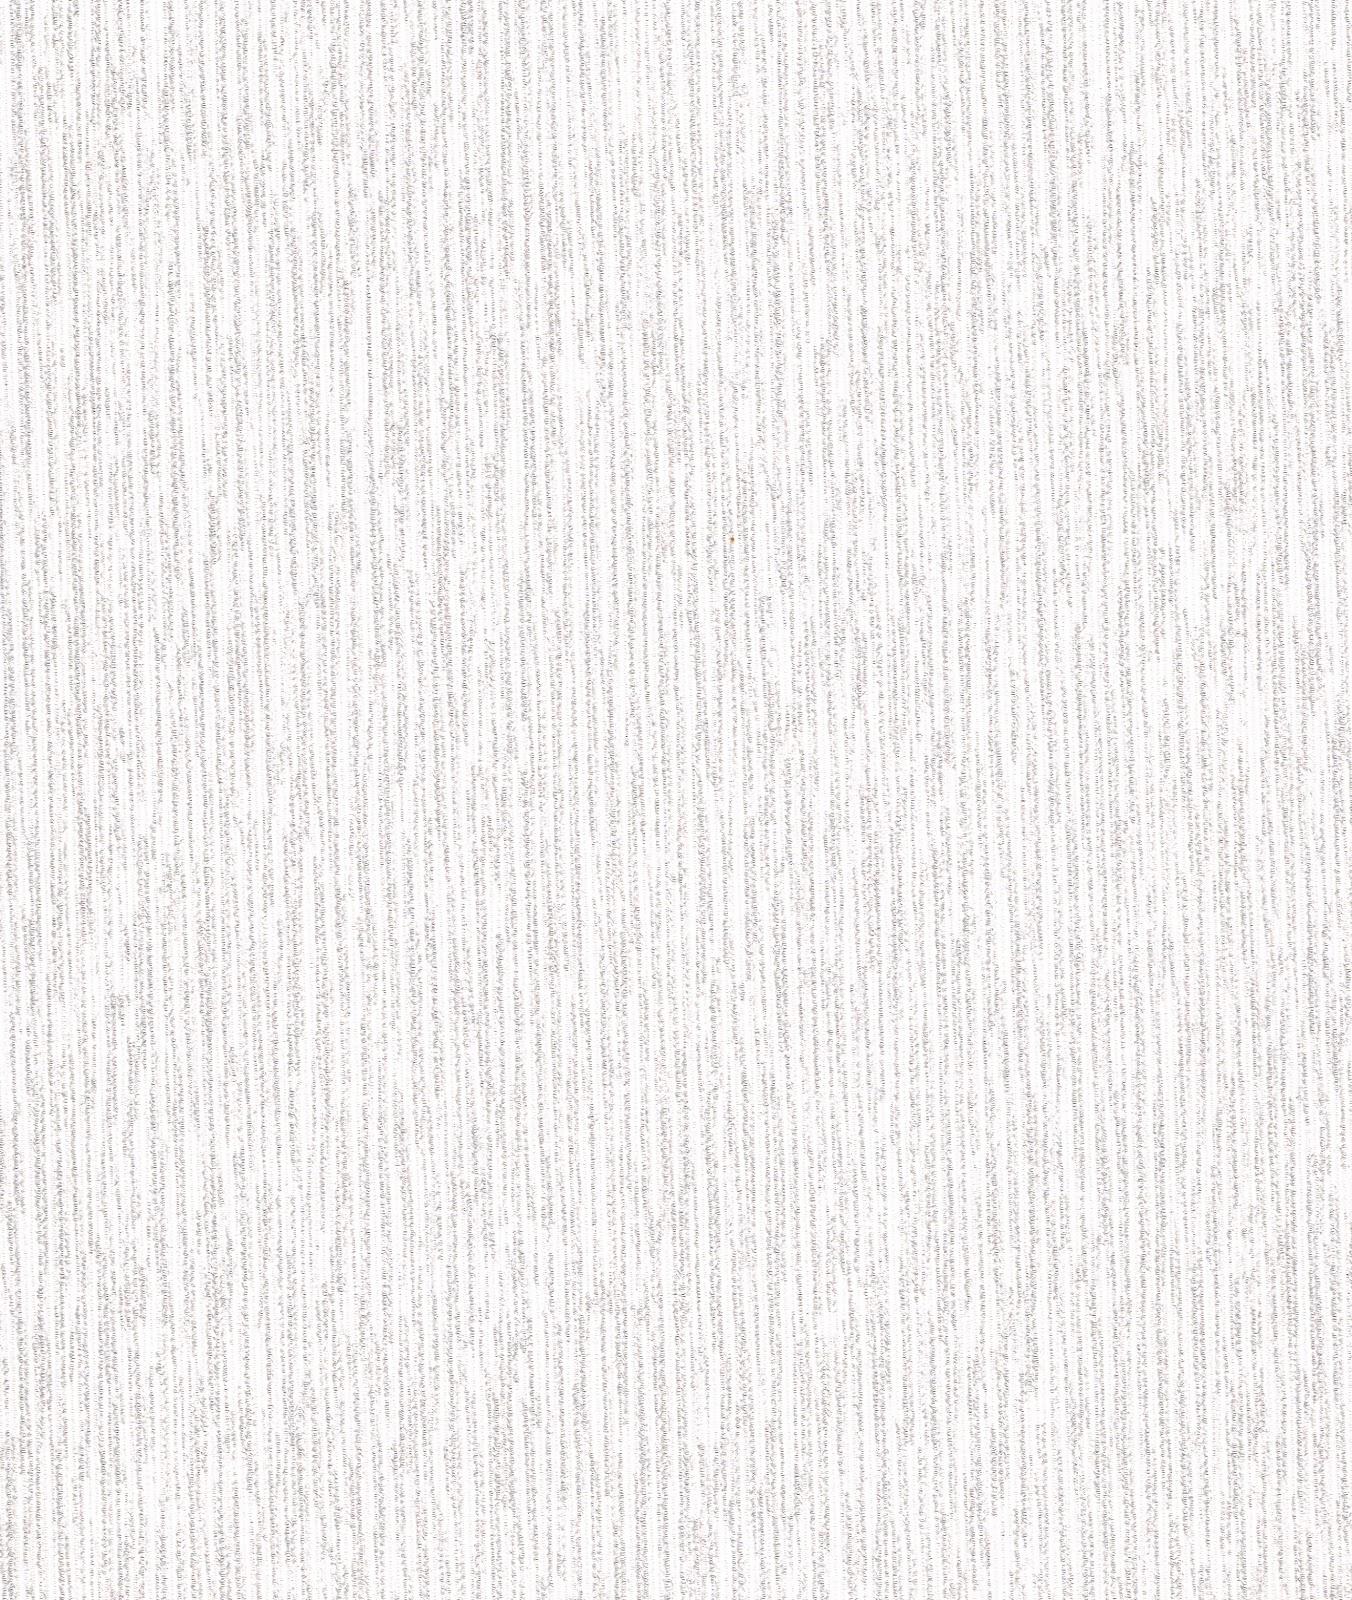 Vinyl Wall Coverings 2017 Grasscloth Wallpaper